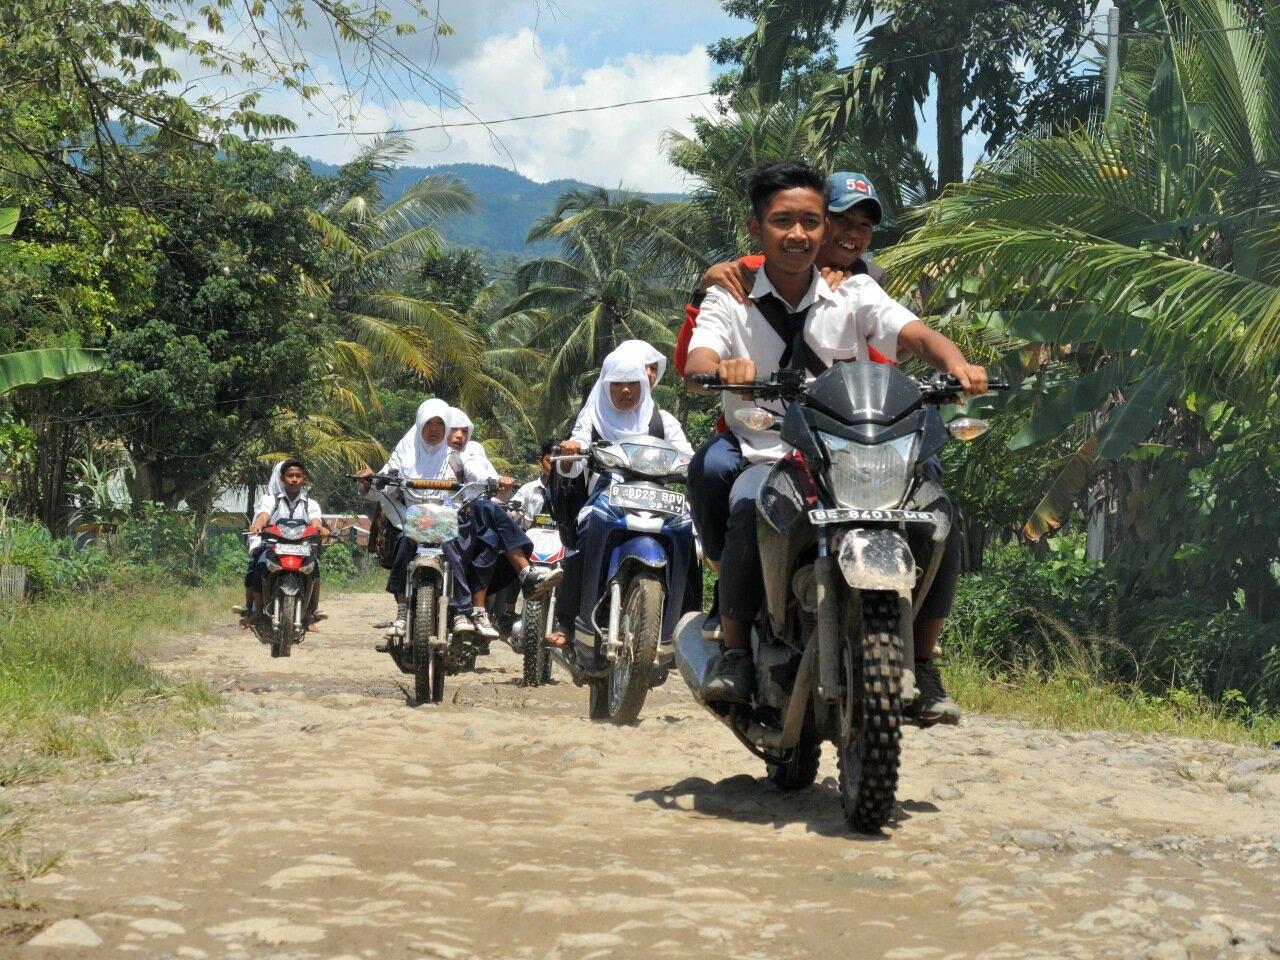 индонезийские школьники на мотобайках